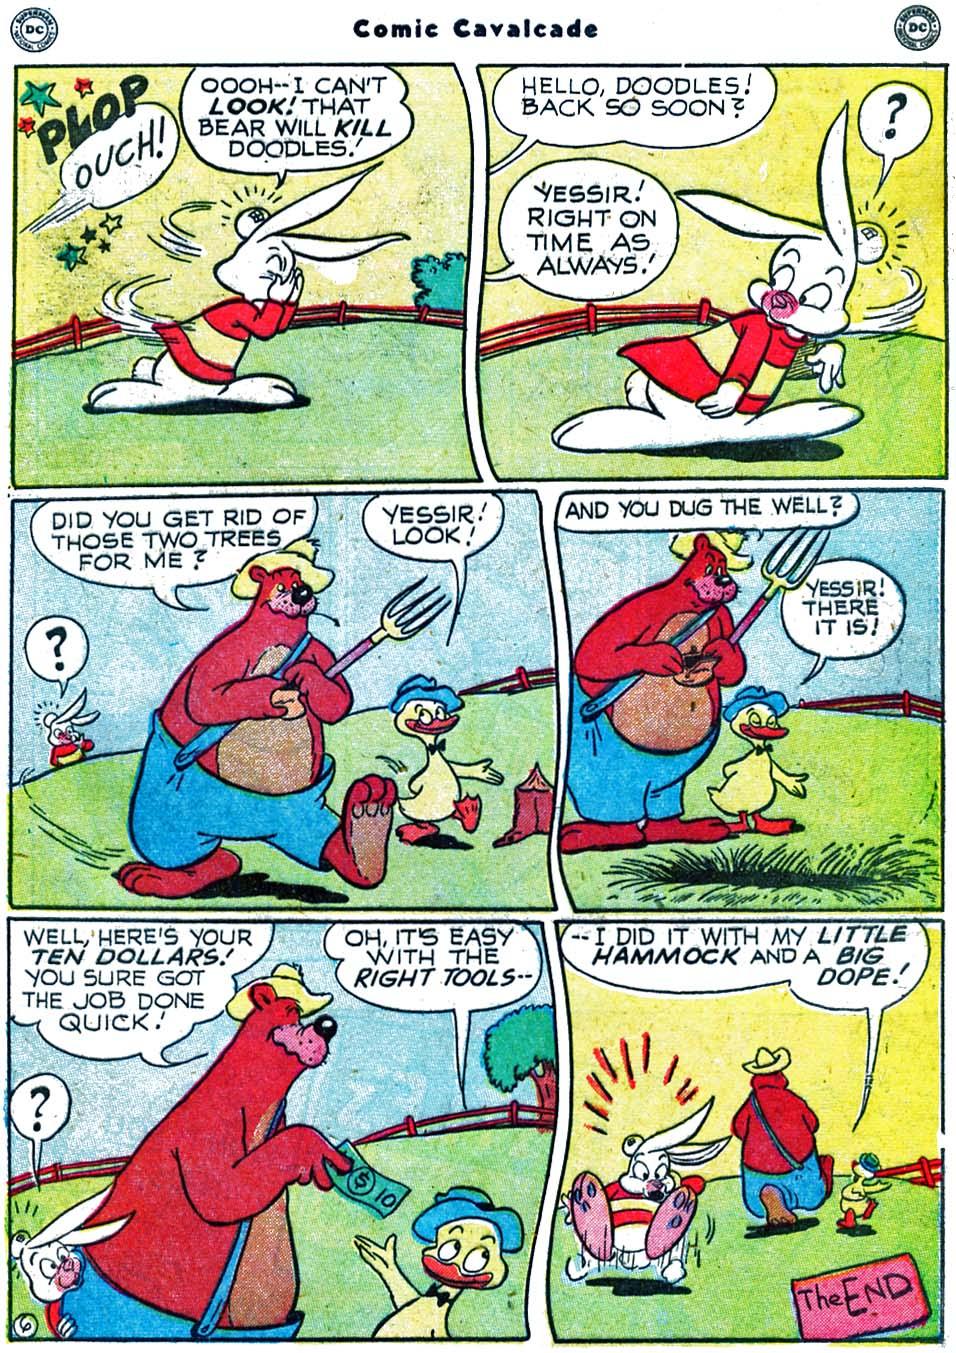 Comic Cavalcade issue 40 - Page 43